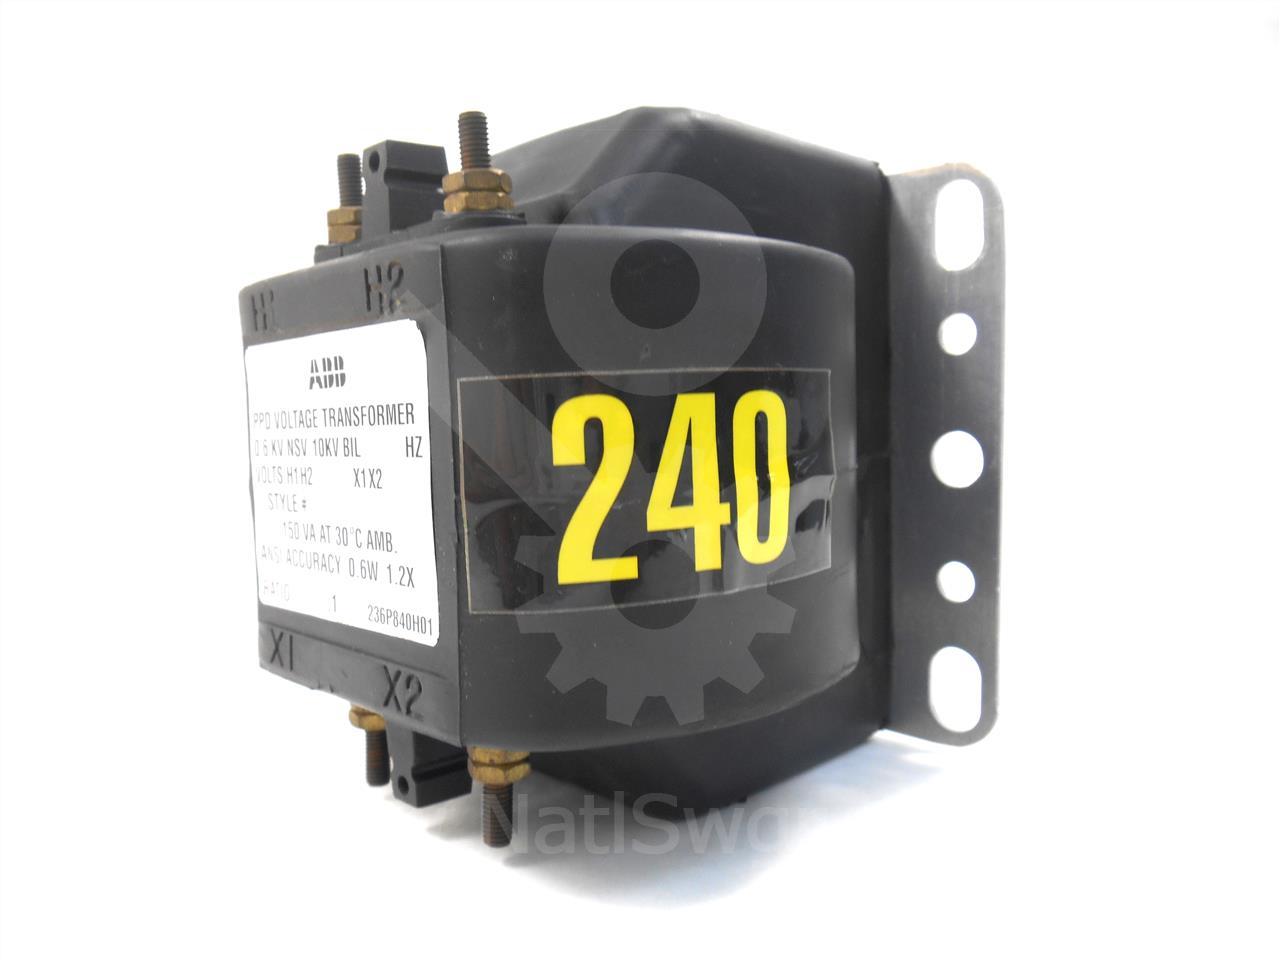 Abb Ite Bbc Abb 2 1 Ppd Potential Transformer